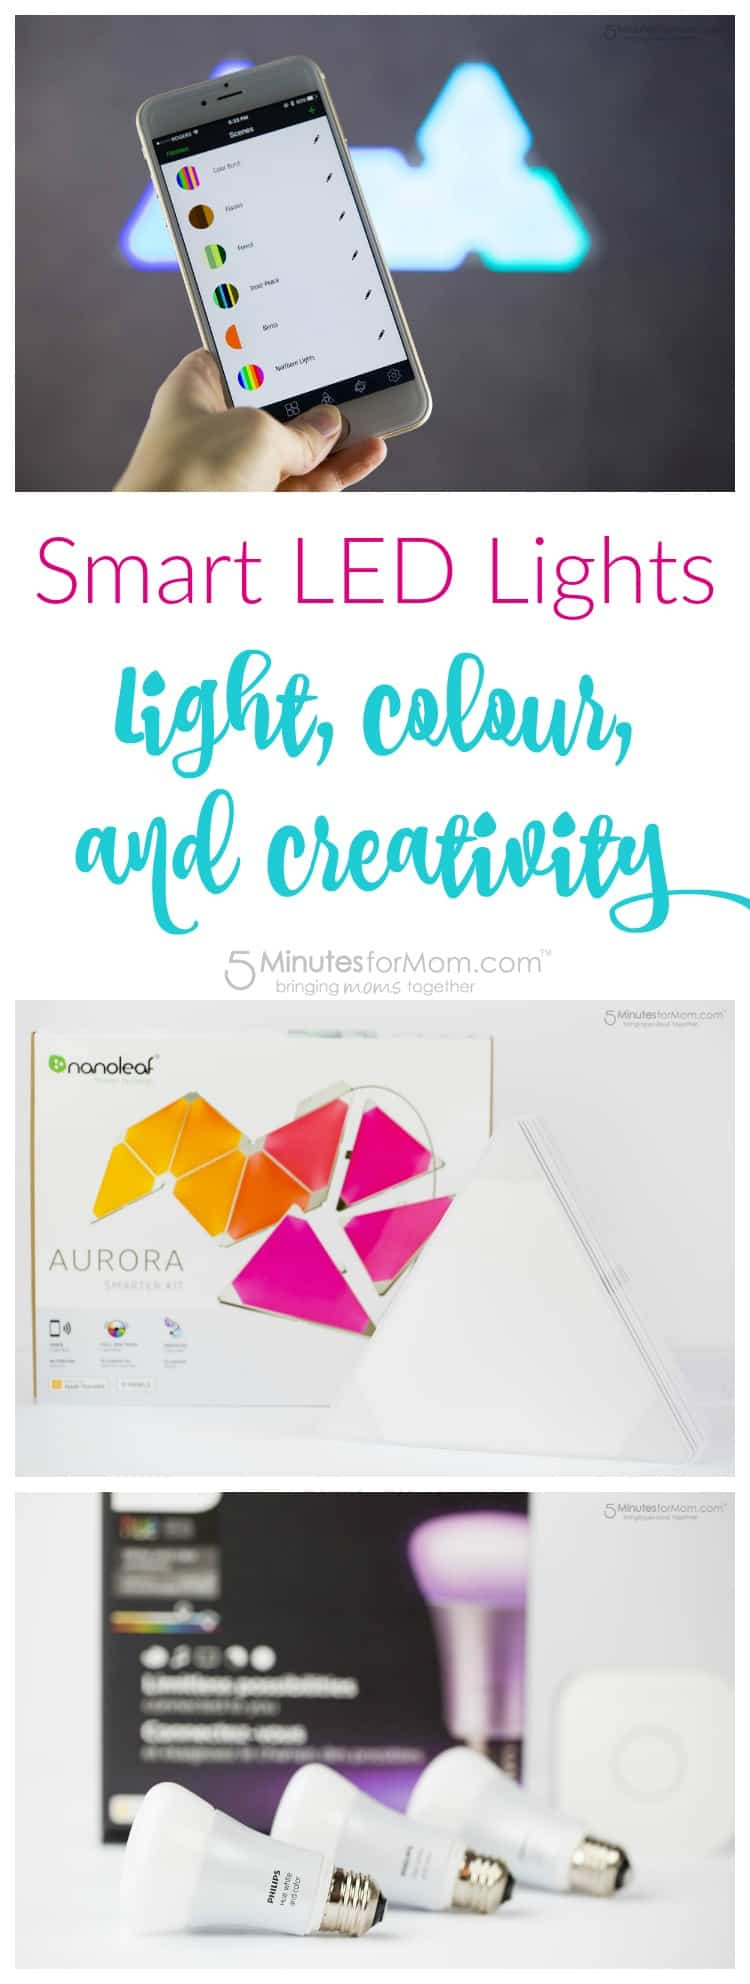 Smart LED Lights - Light Colour Creativity